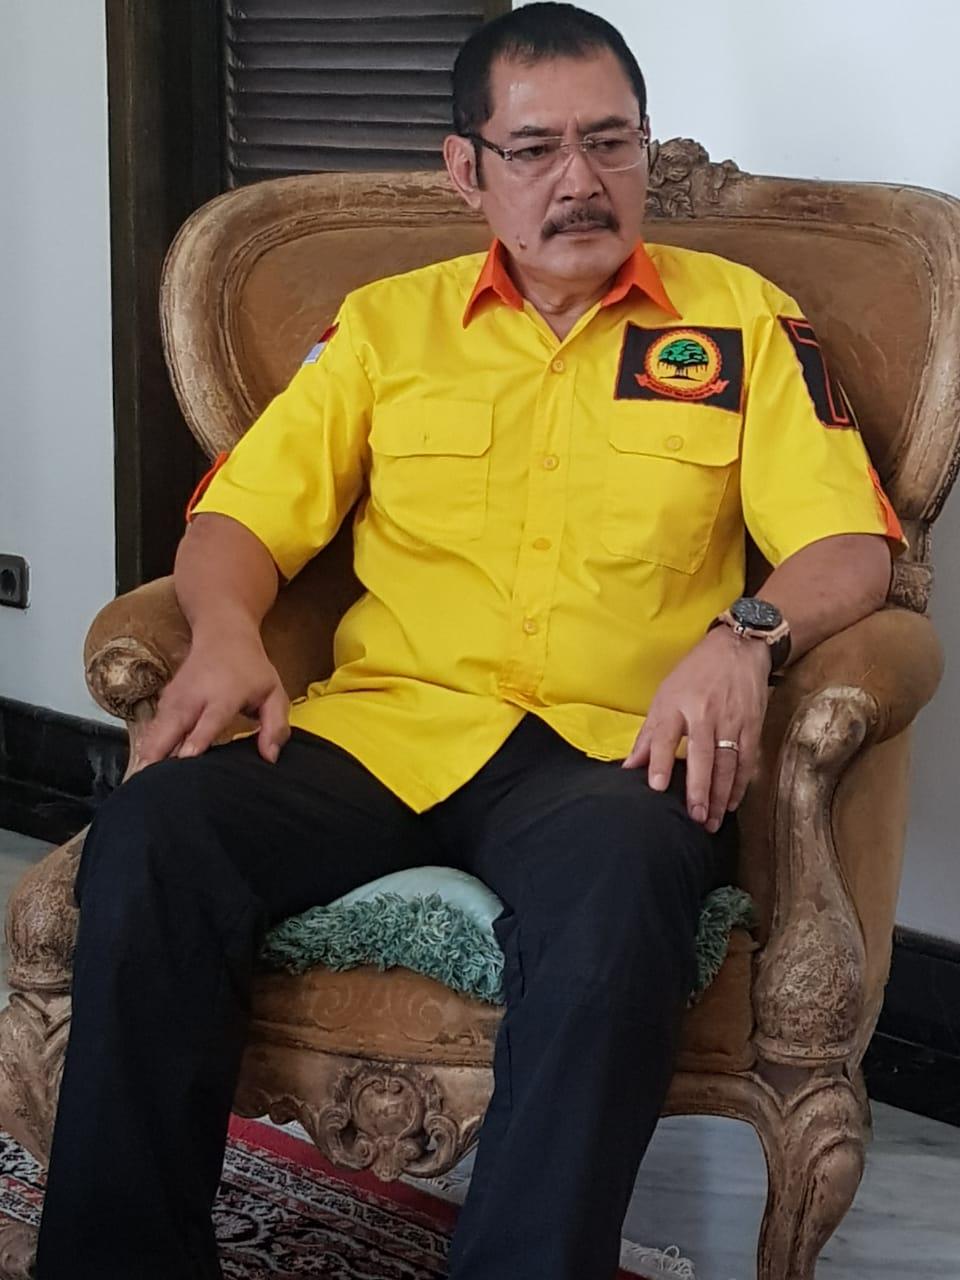 IMG 20190323 WA0032 - Ini Alasan Sri Mulyani Cegah Bambang Trihatmodjo ke Luar Negeri